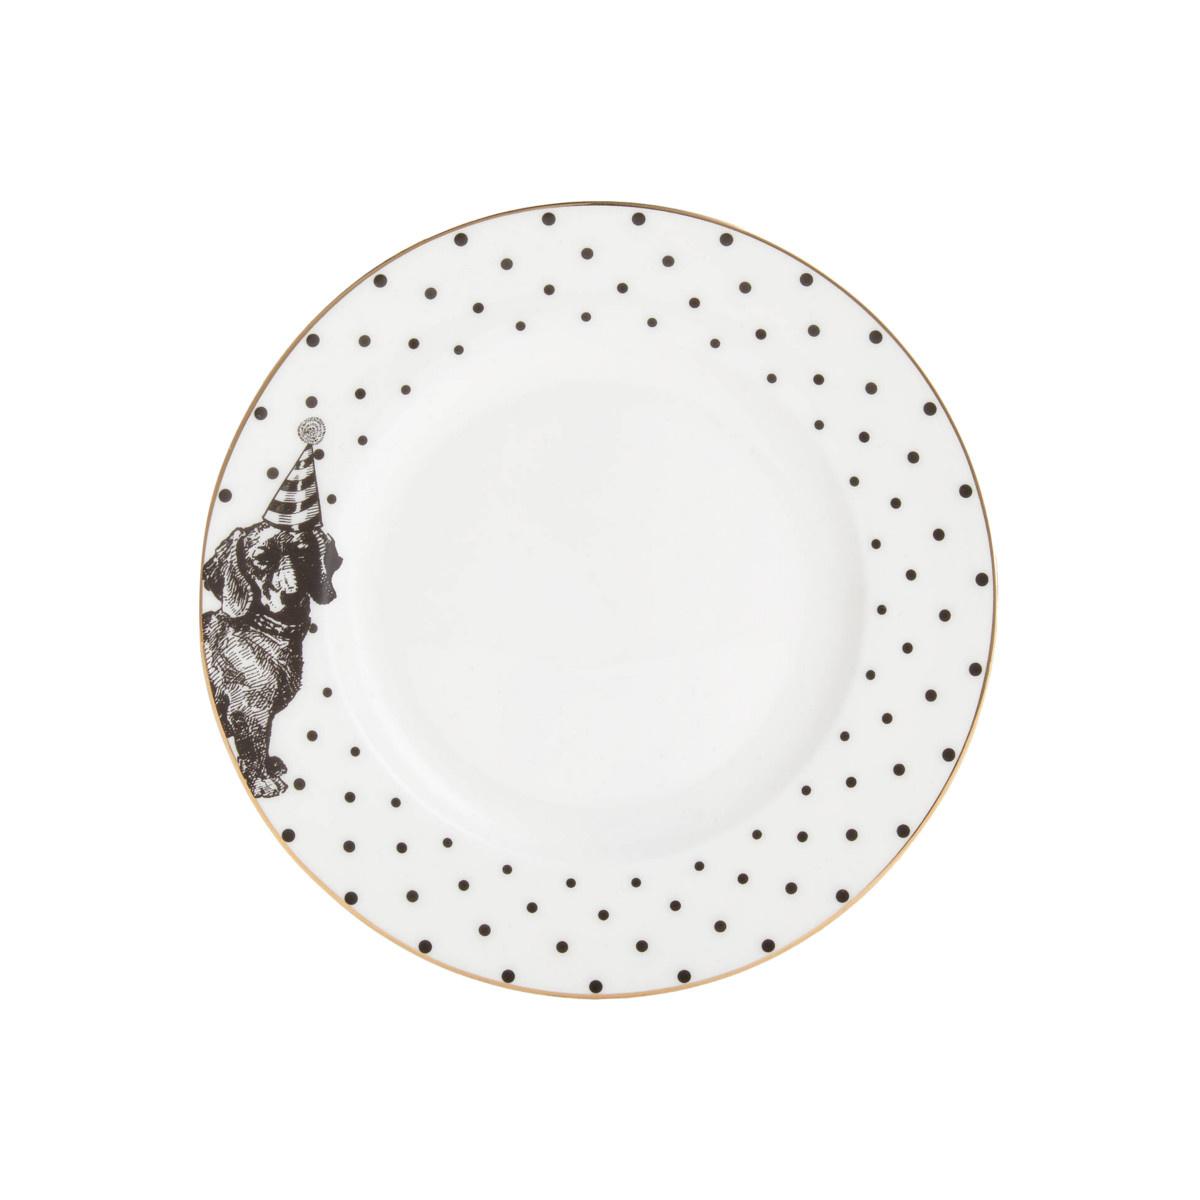 Yvonne Ellen London Monochrome 2-er Set Teller Ø 16 cm - Dachshund Motiv - Bone China Porzellan